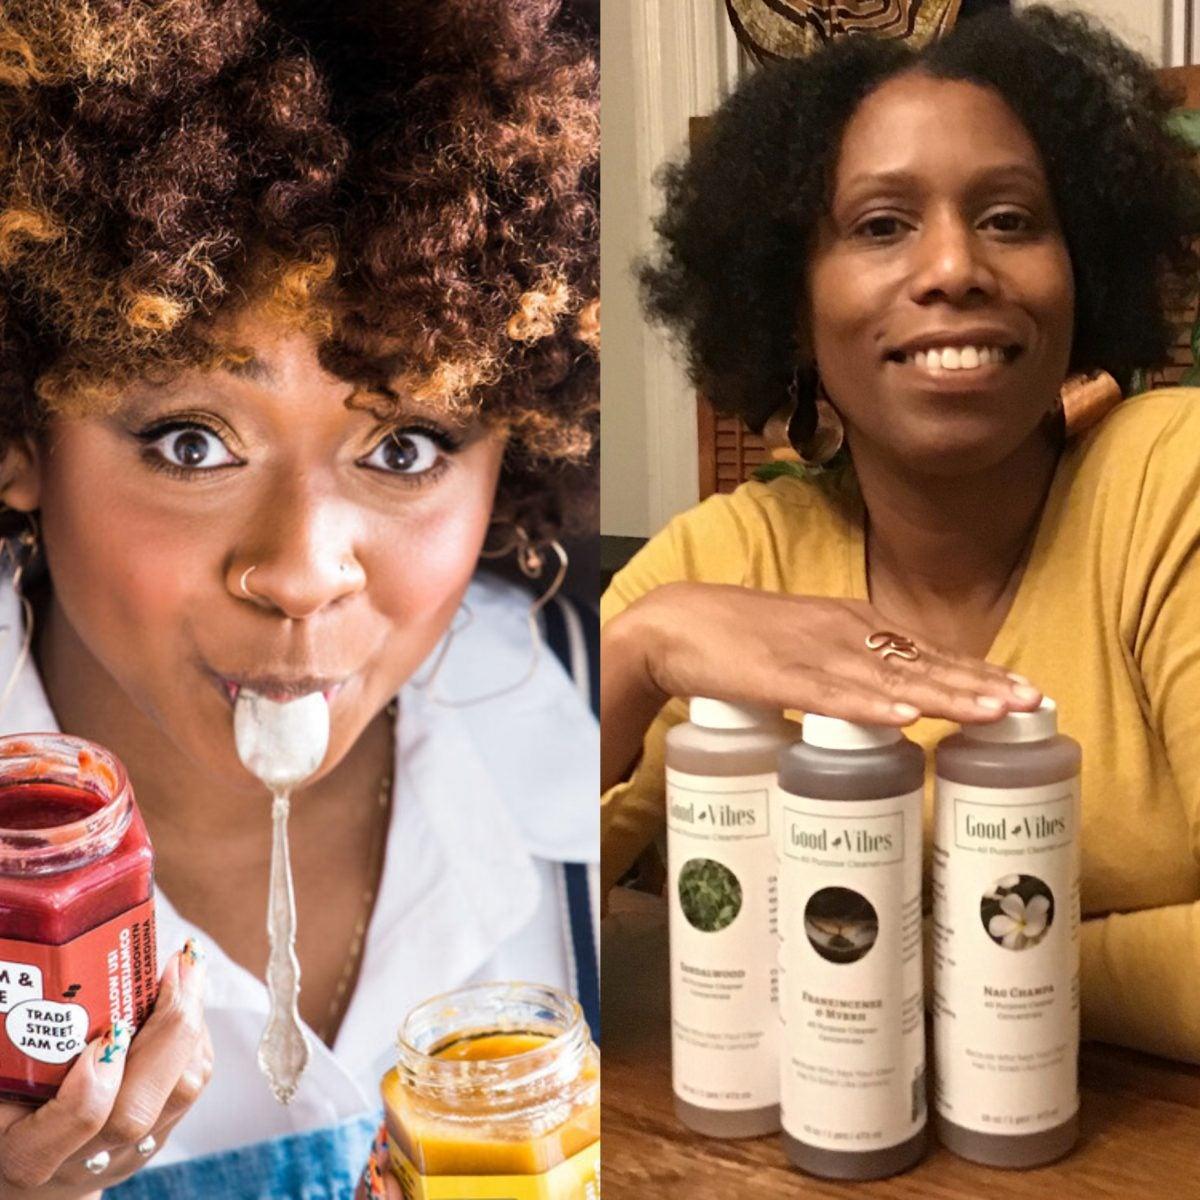 Meet 10 More Black Women Entrepreneurs Preparing To Win Big For Their Businesses